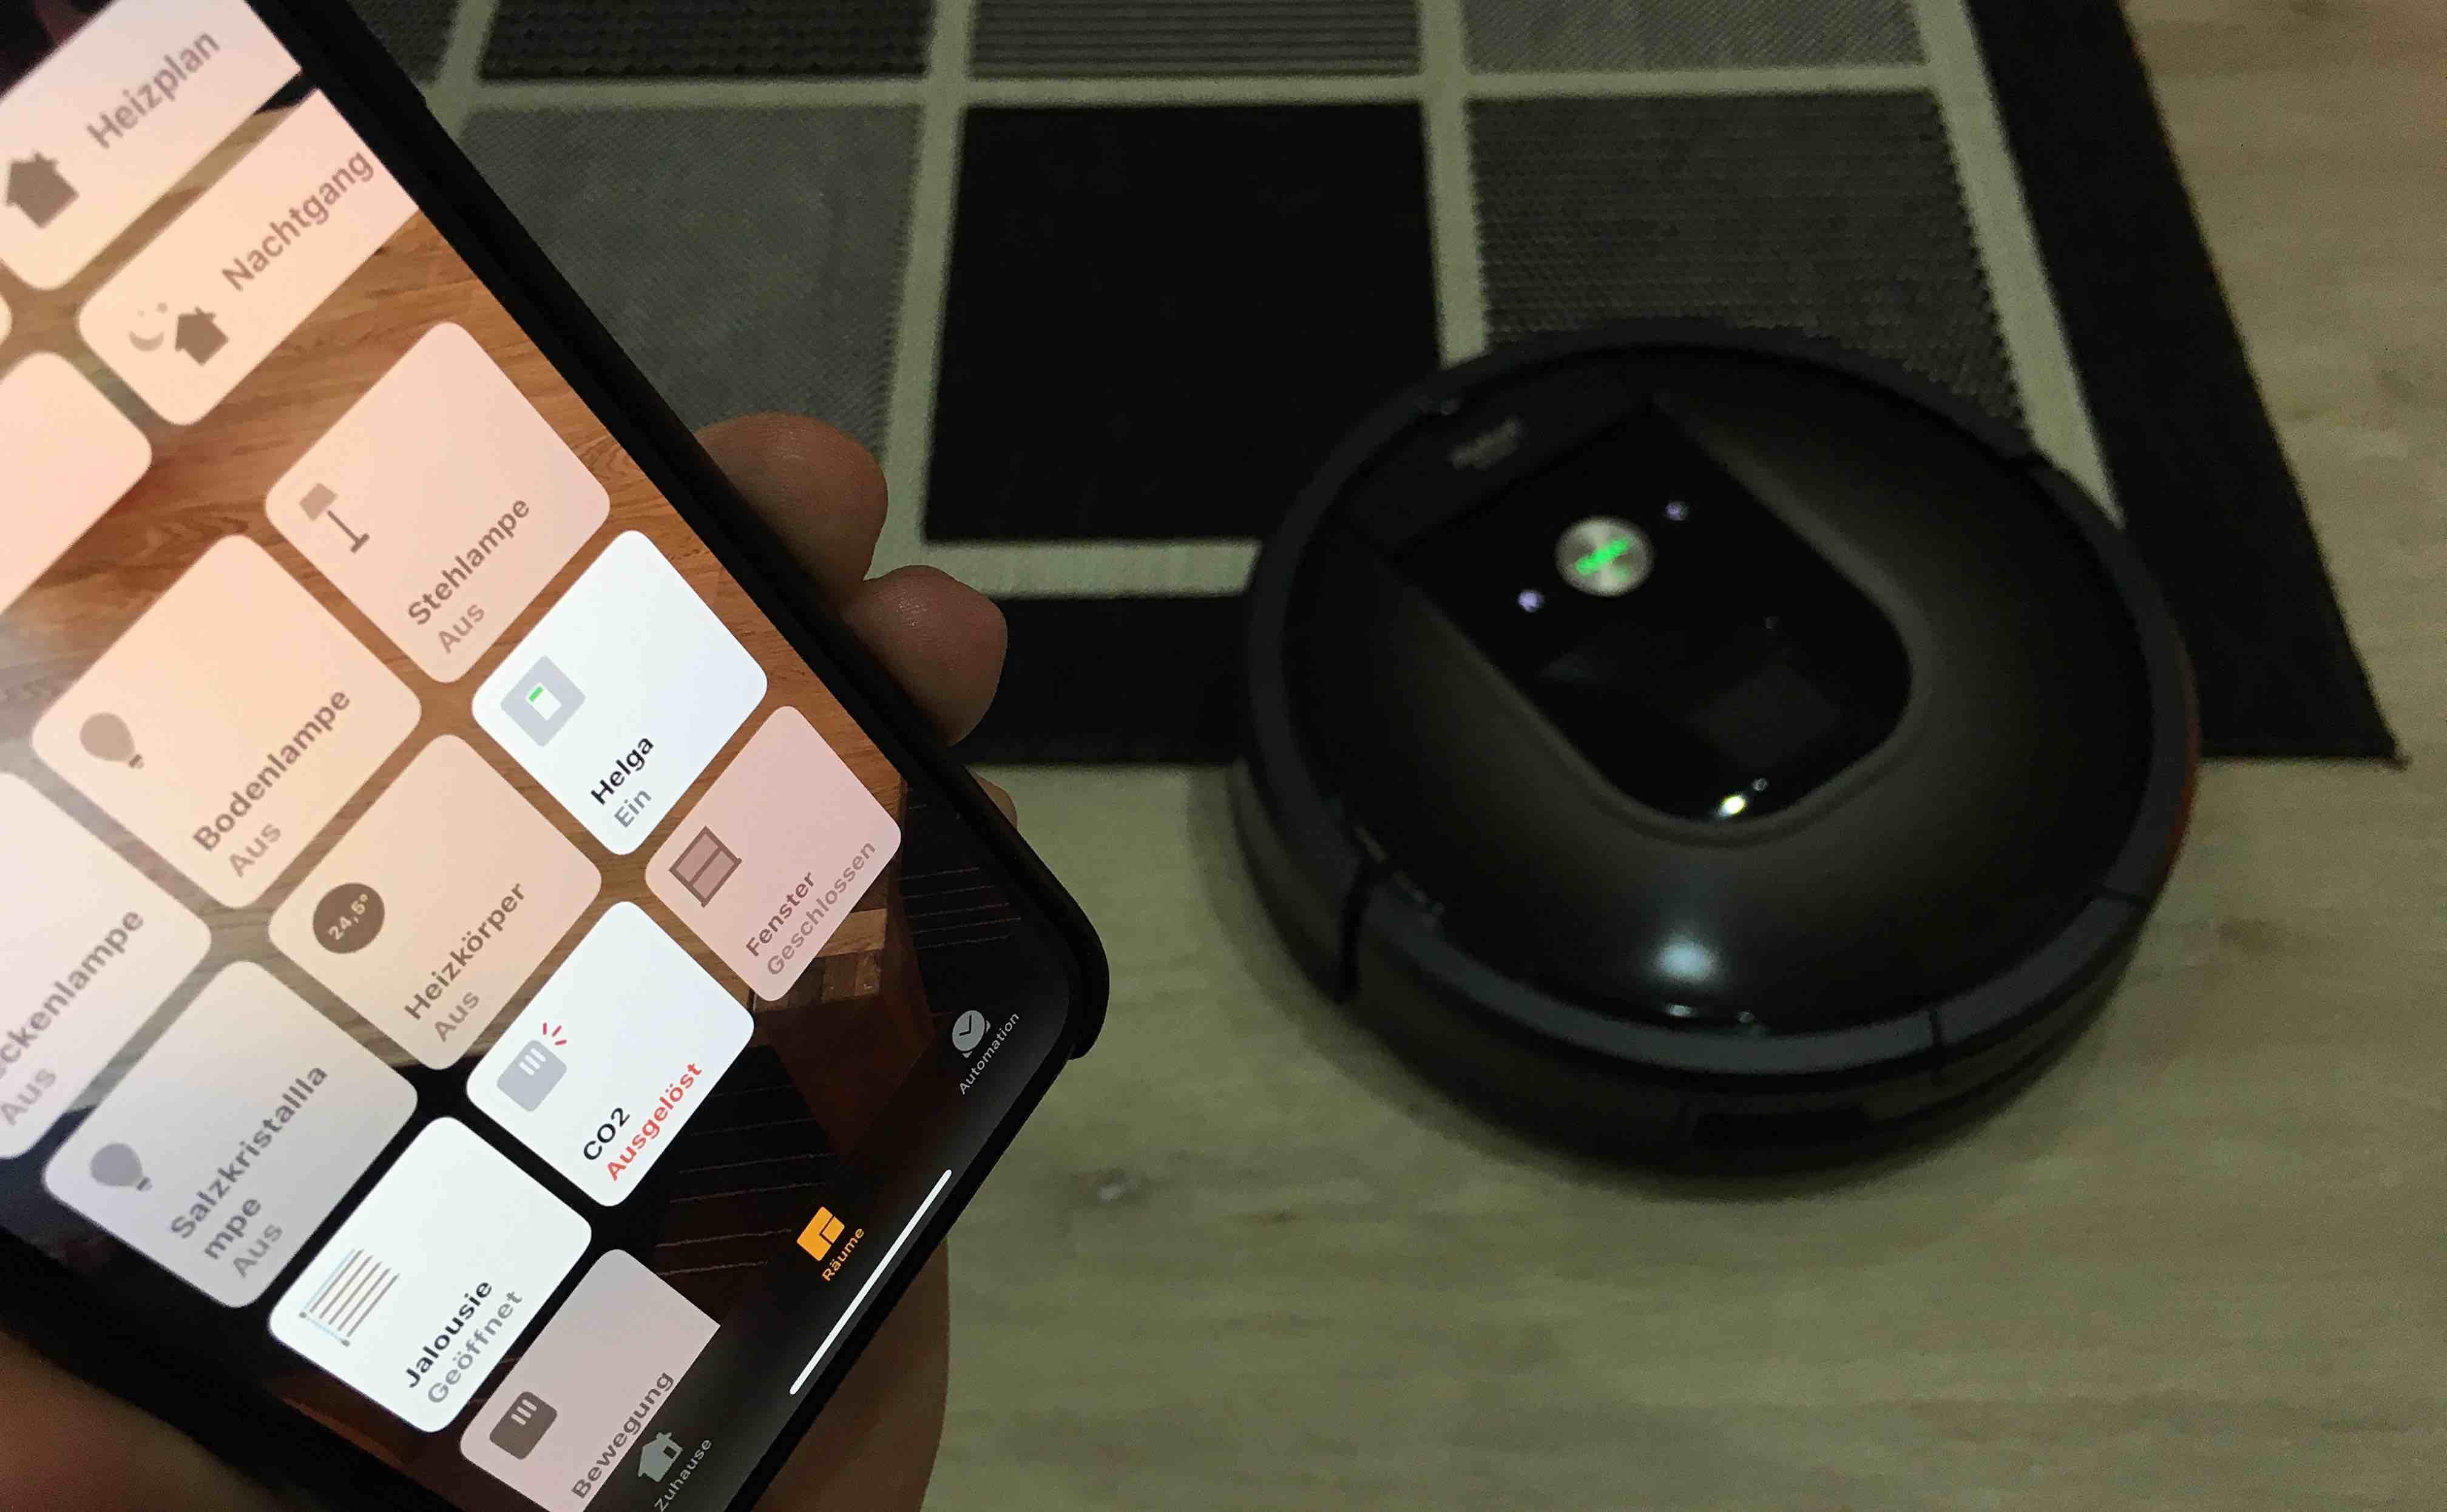 Anleitung-Wie-du-einen-iRobot-Roomba-in-HomeKit-nutzen-kannst1 Anleitung: Wie du einen iRobot Roomba in HomeKit nutzen kannst